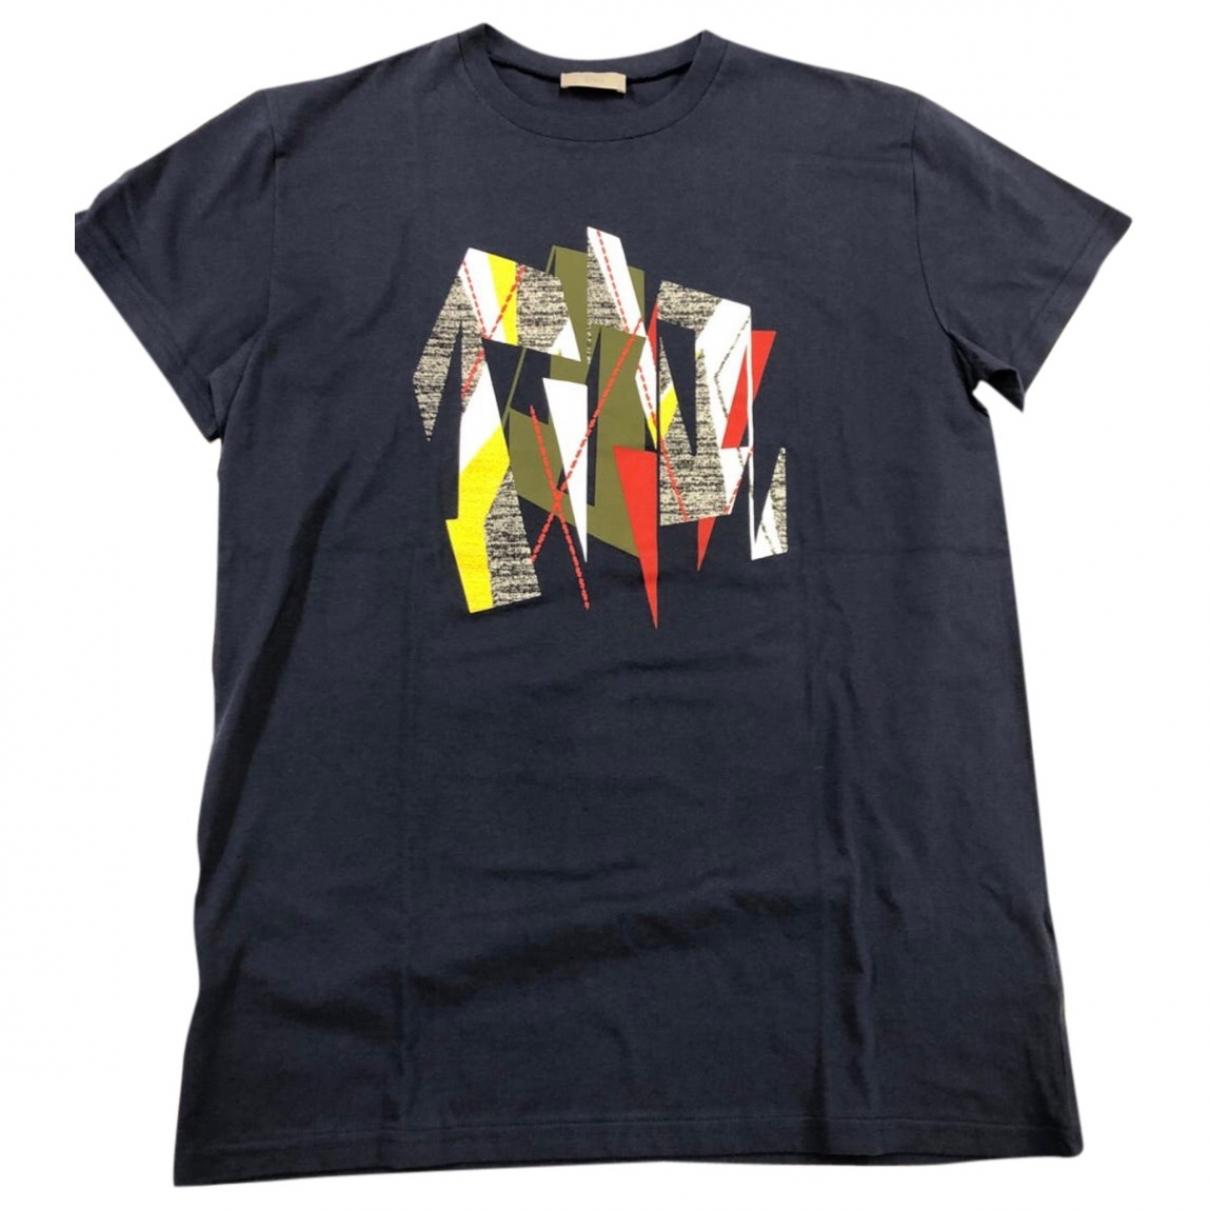 Dior Homme \N Multicolour Cotton T-shirts for Men M International